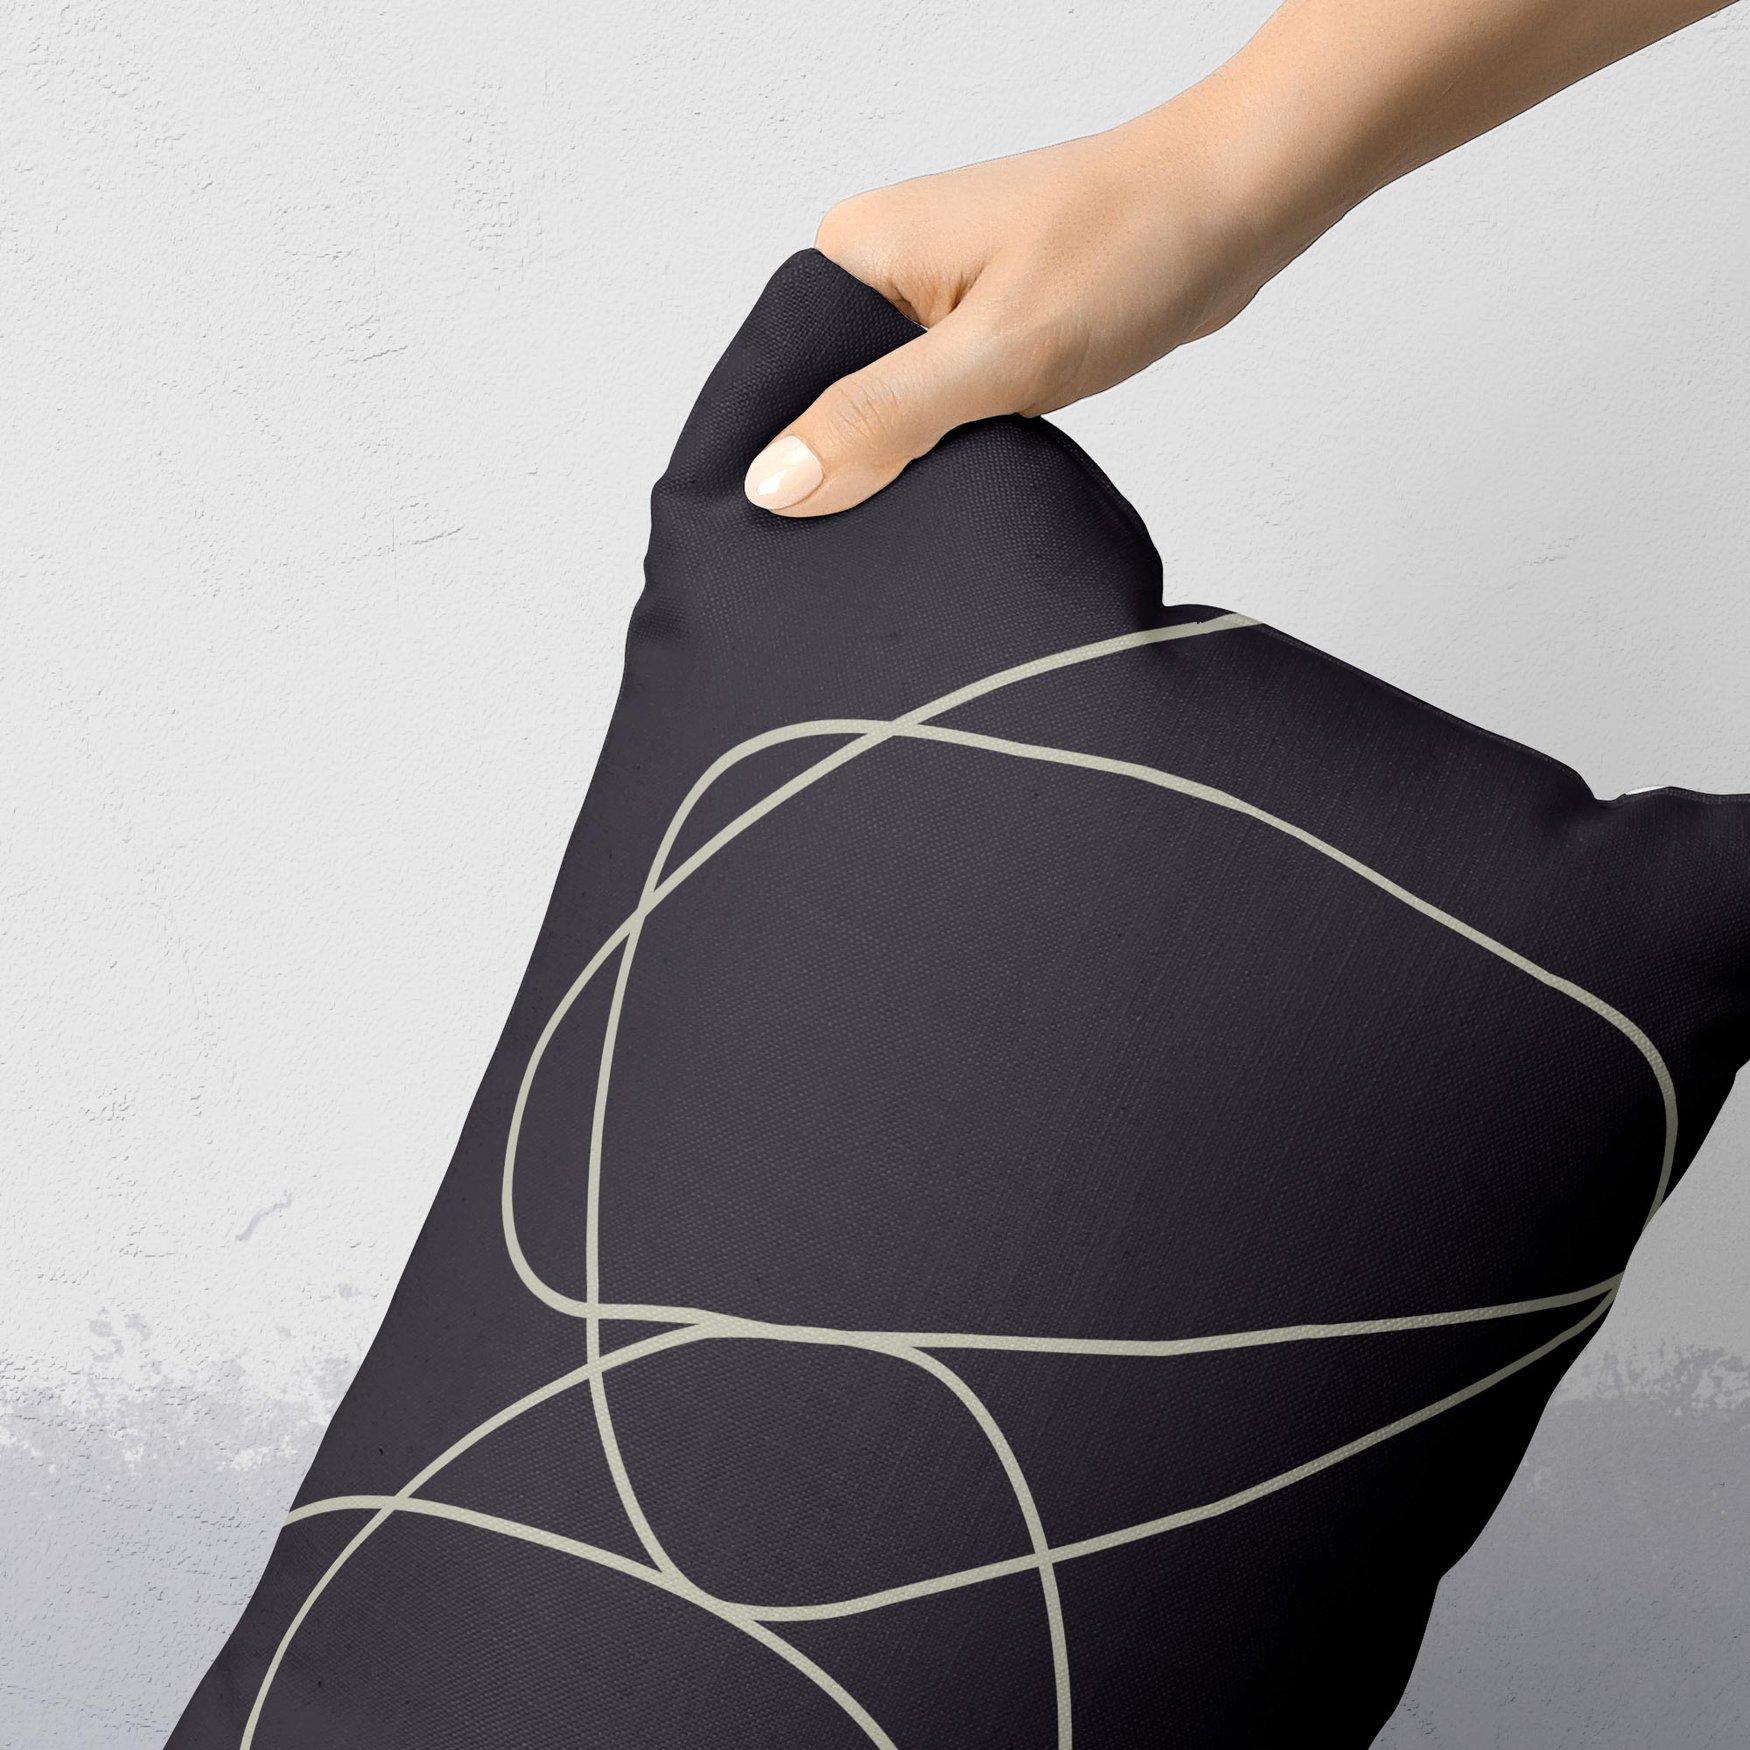 Image of Rock Garden No. 1 Rectangular Throw Pillow in Charcoal Gray